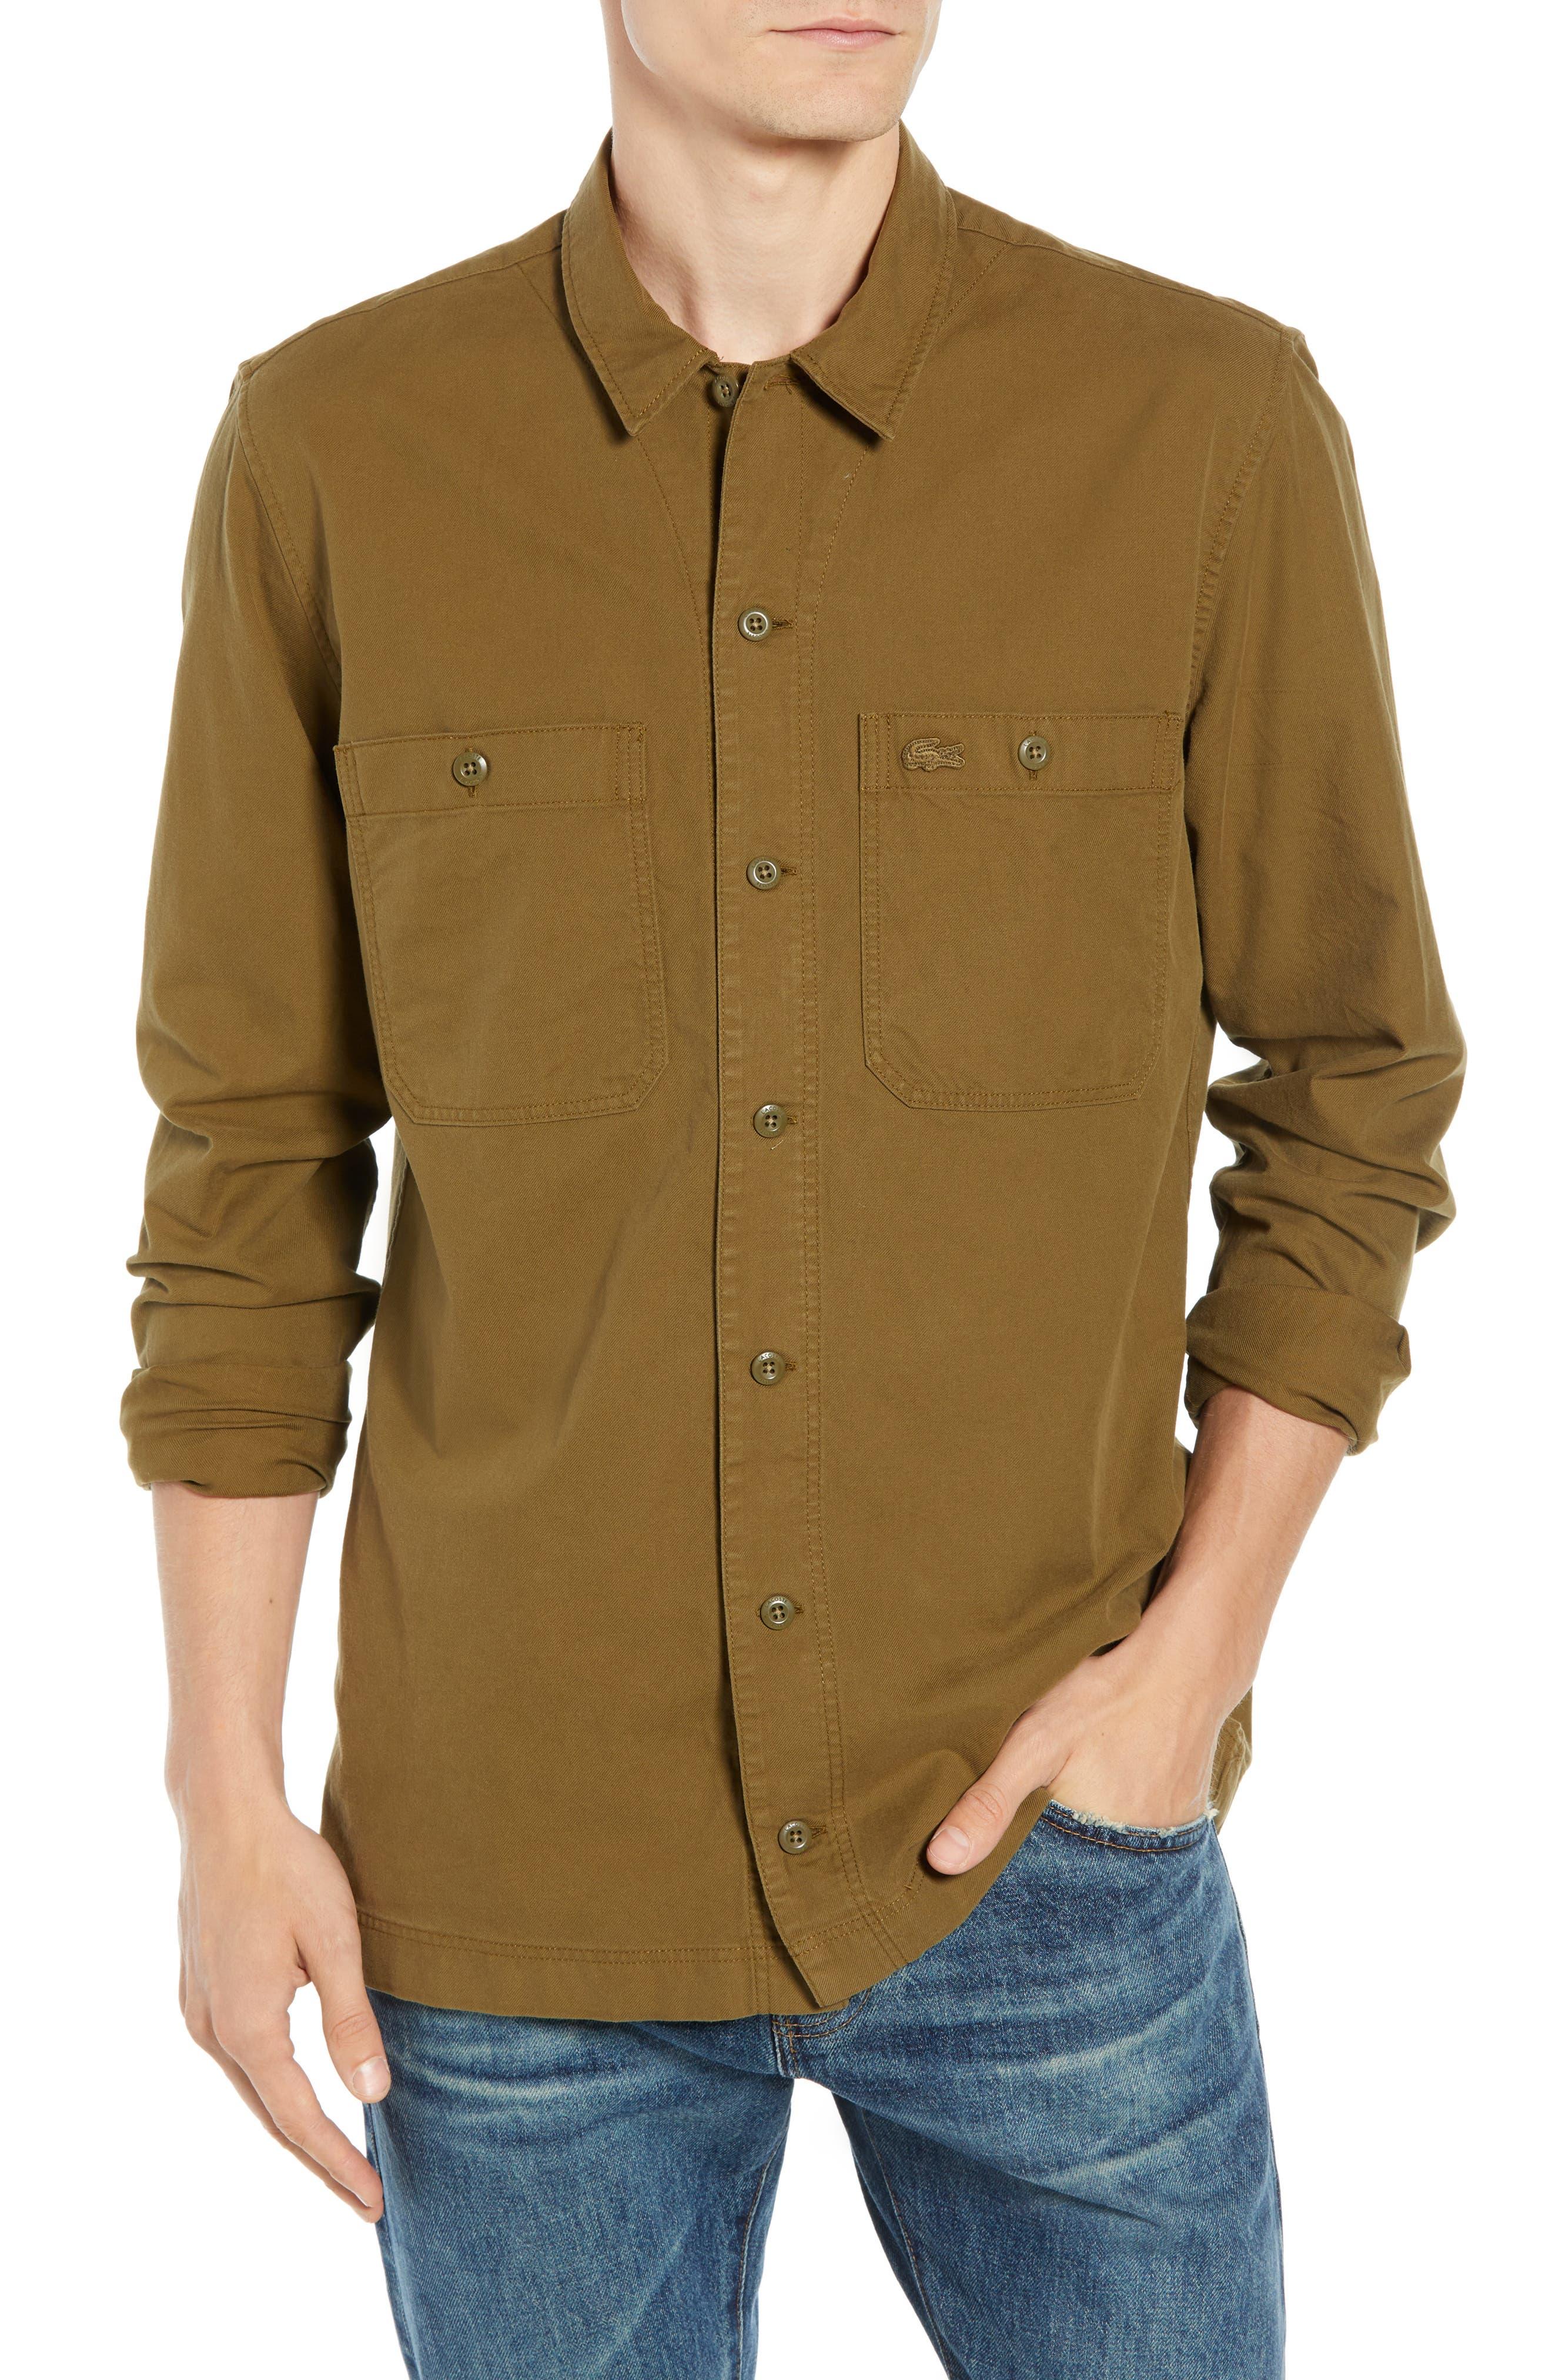 Lacoste Regular Fit Lightweight Cotton Flannel Shirt, Brown